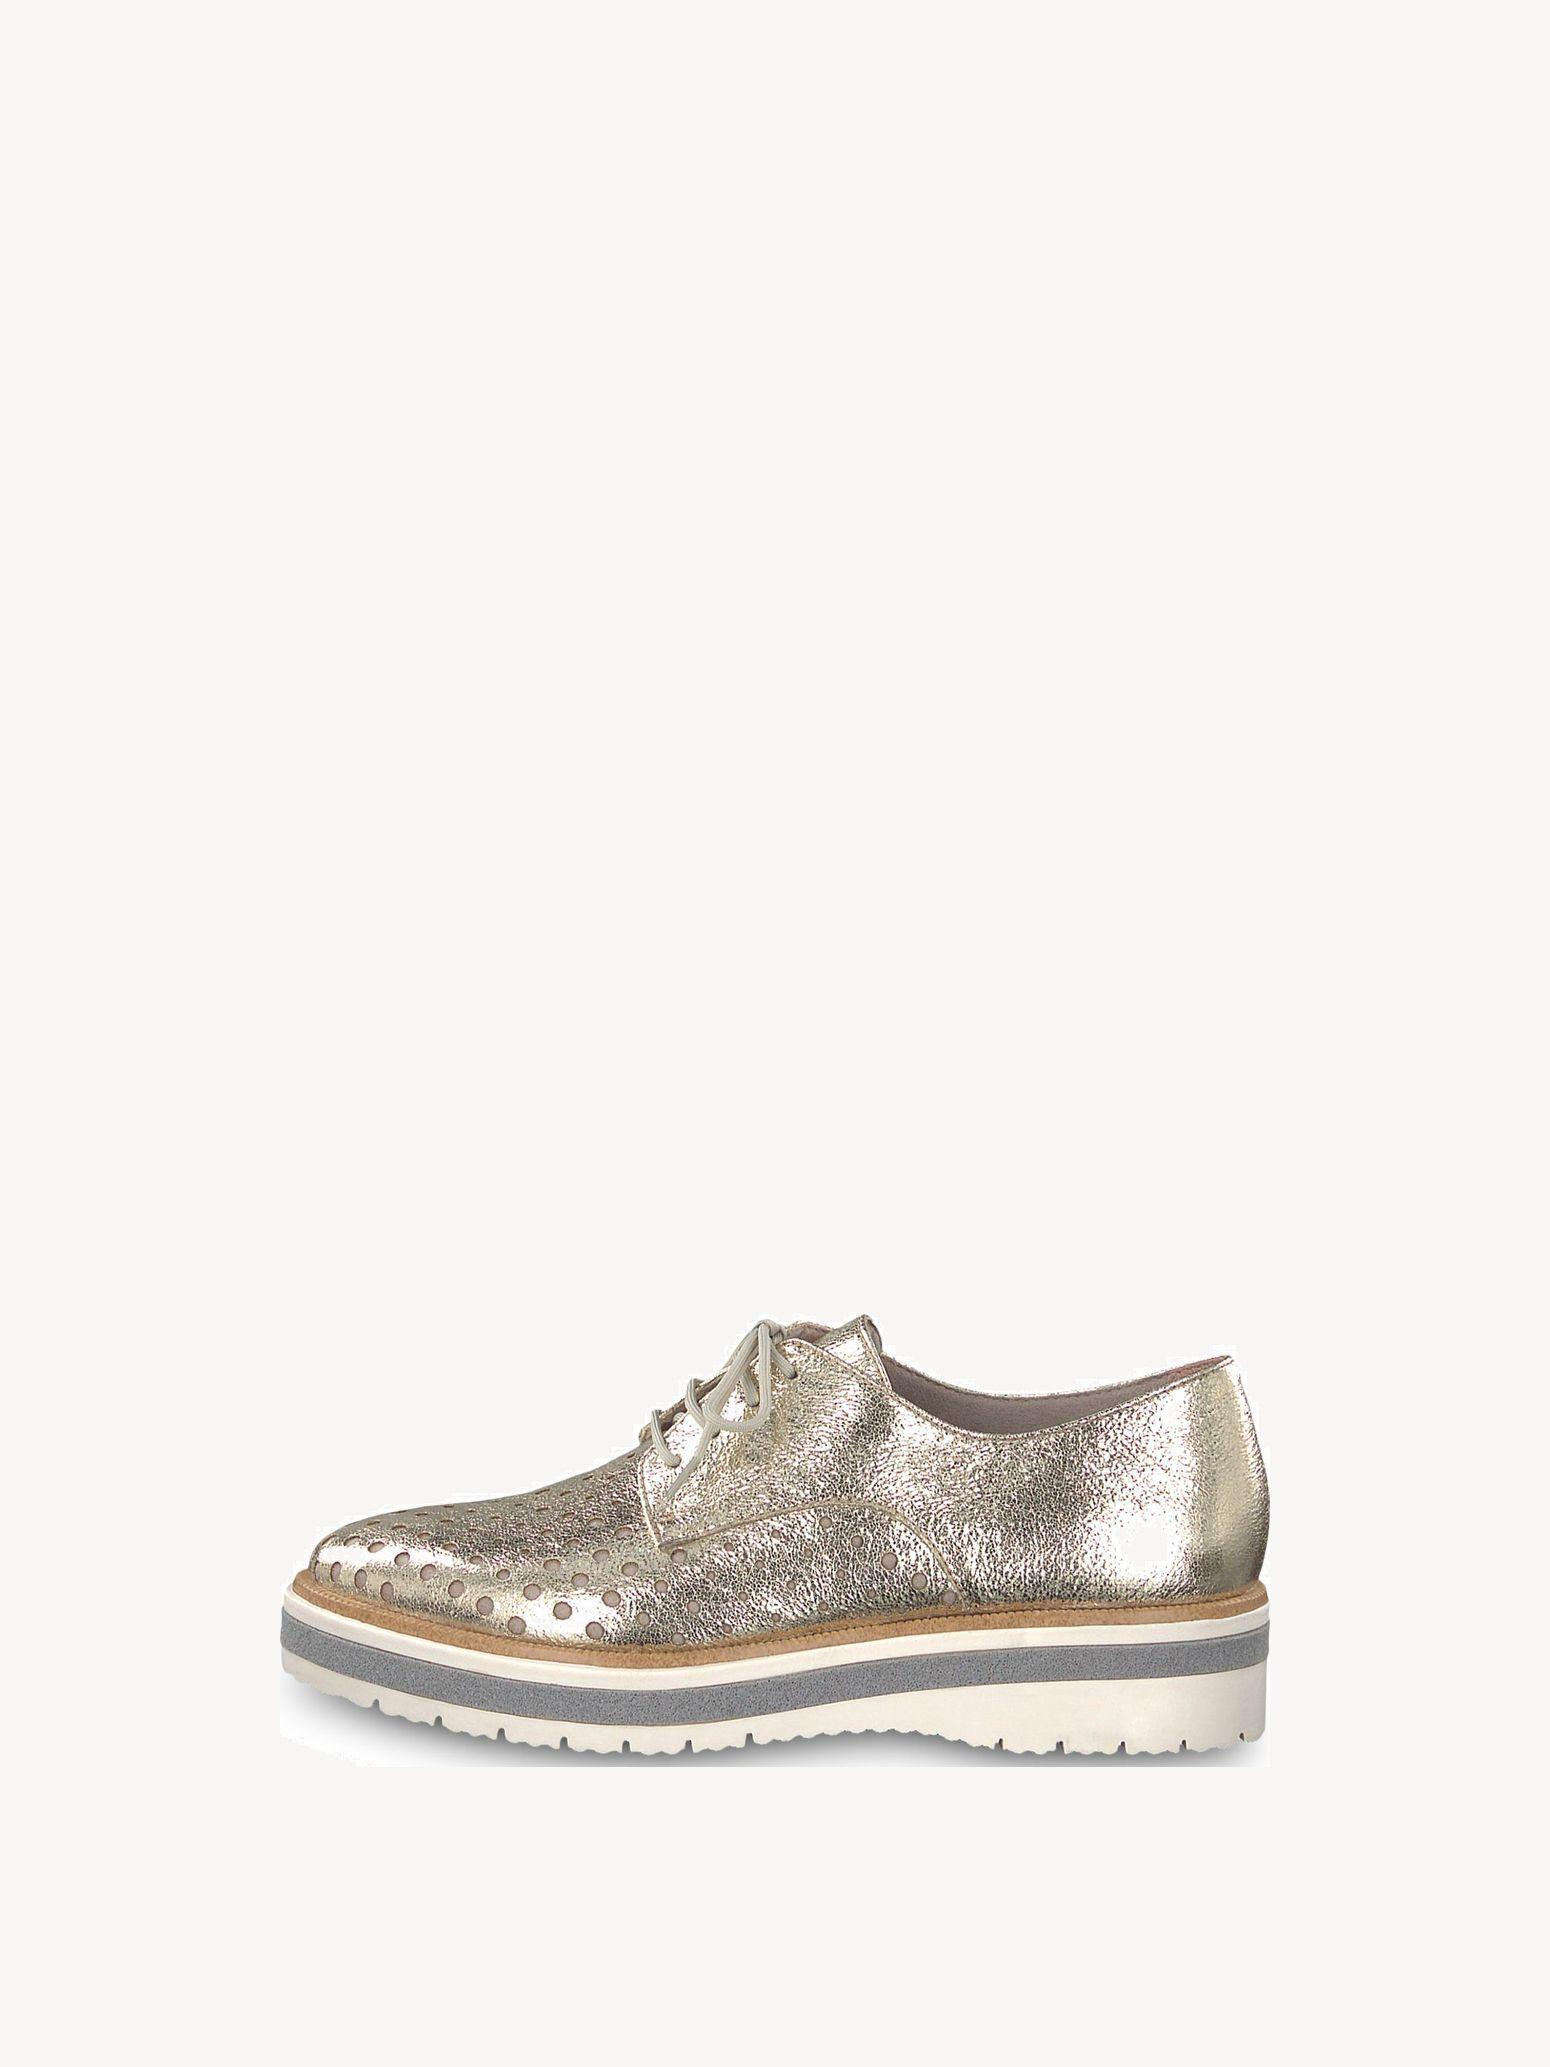 Chaussure De Tamaris 23753 Femmes - Argent py8dTRnYF